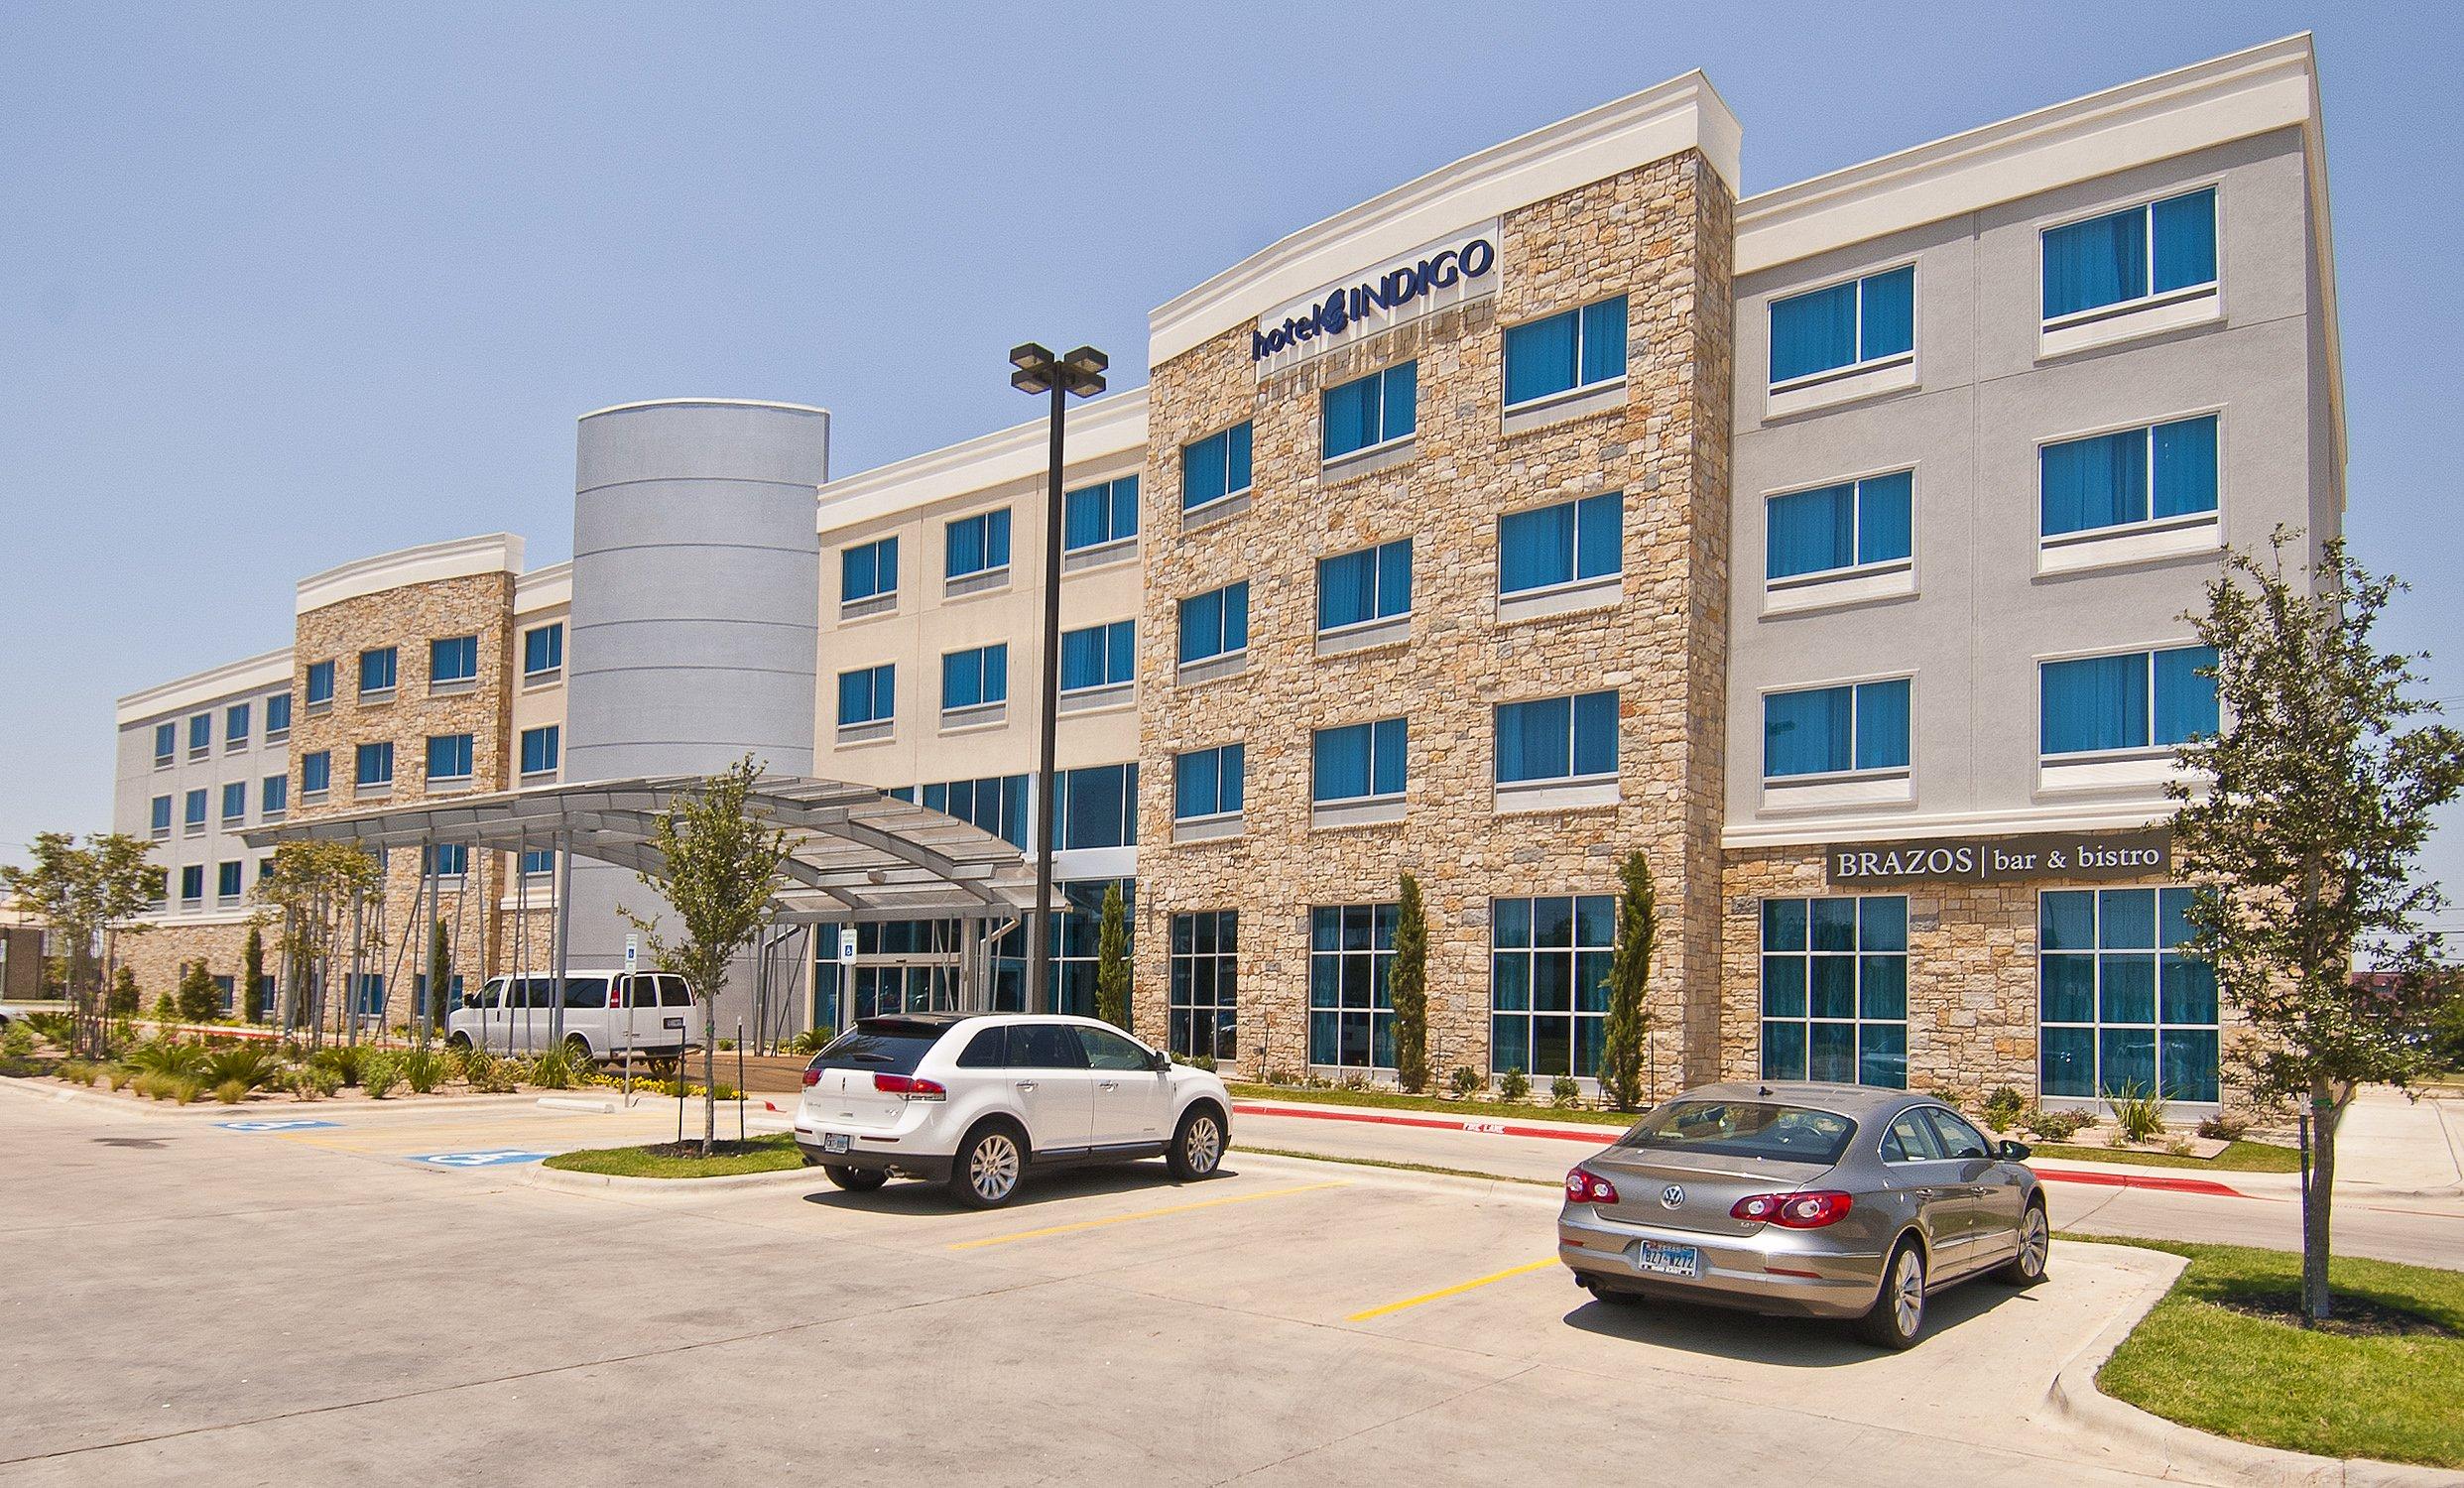 Hotel Indigo Baylor